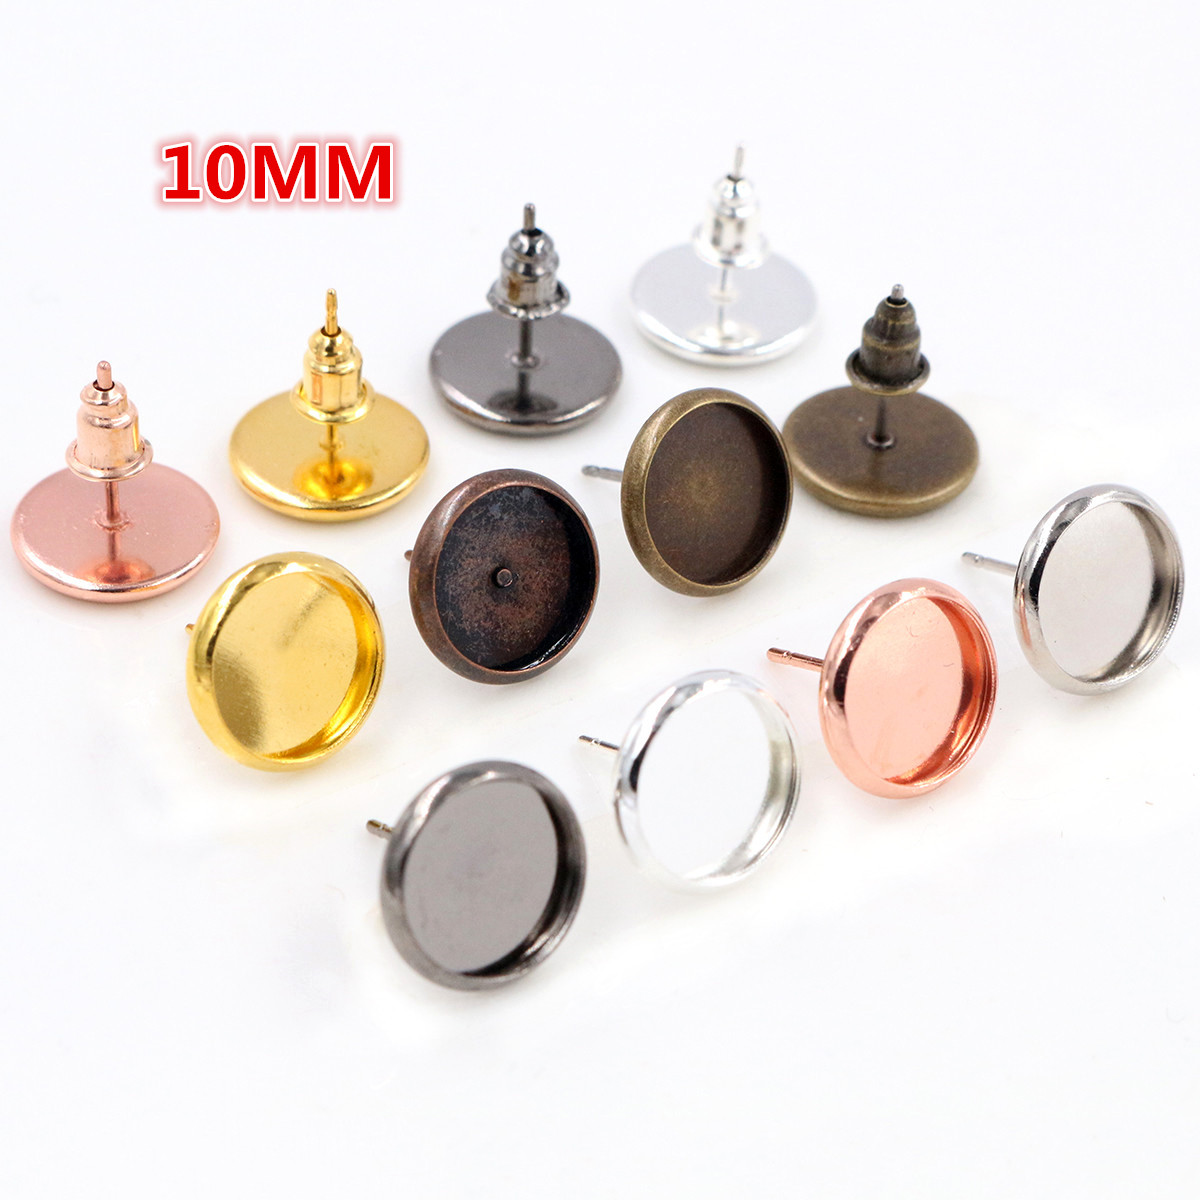 10mm 20pcs 7 Colors Plated Earring Studs,Earrings Blank/Base,Fit 10mm Glass Cabochons,earring Setting;Earring Bezels